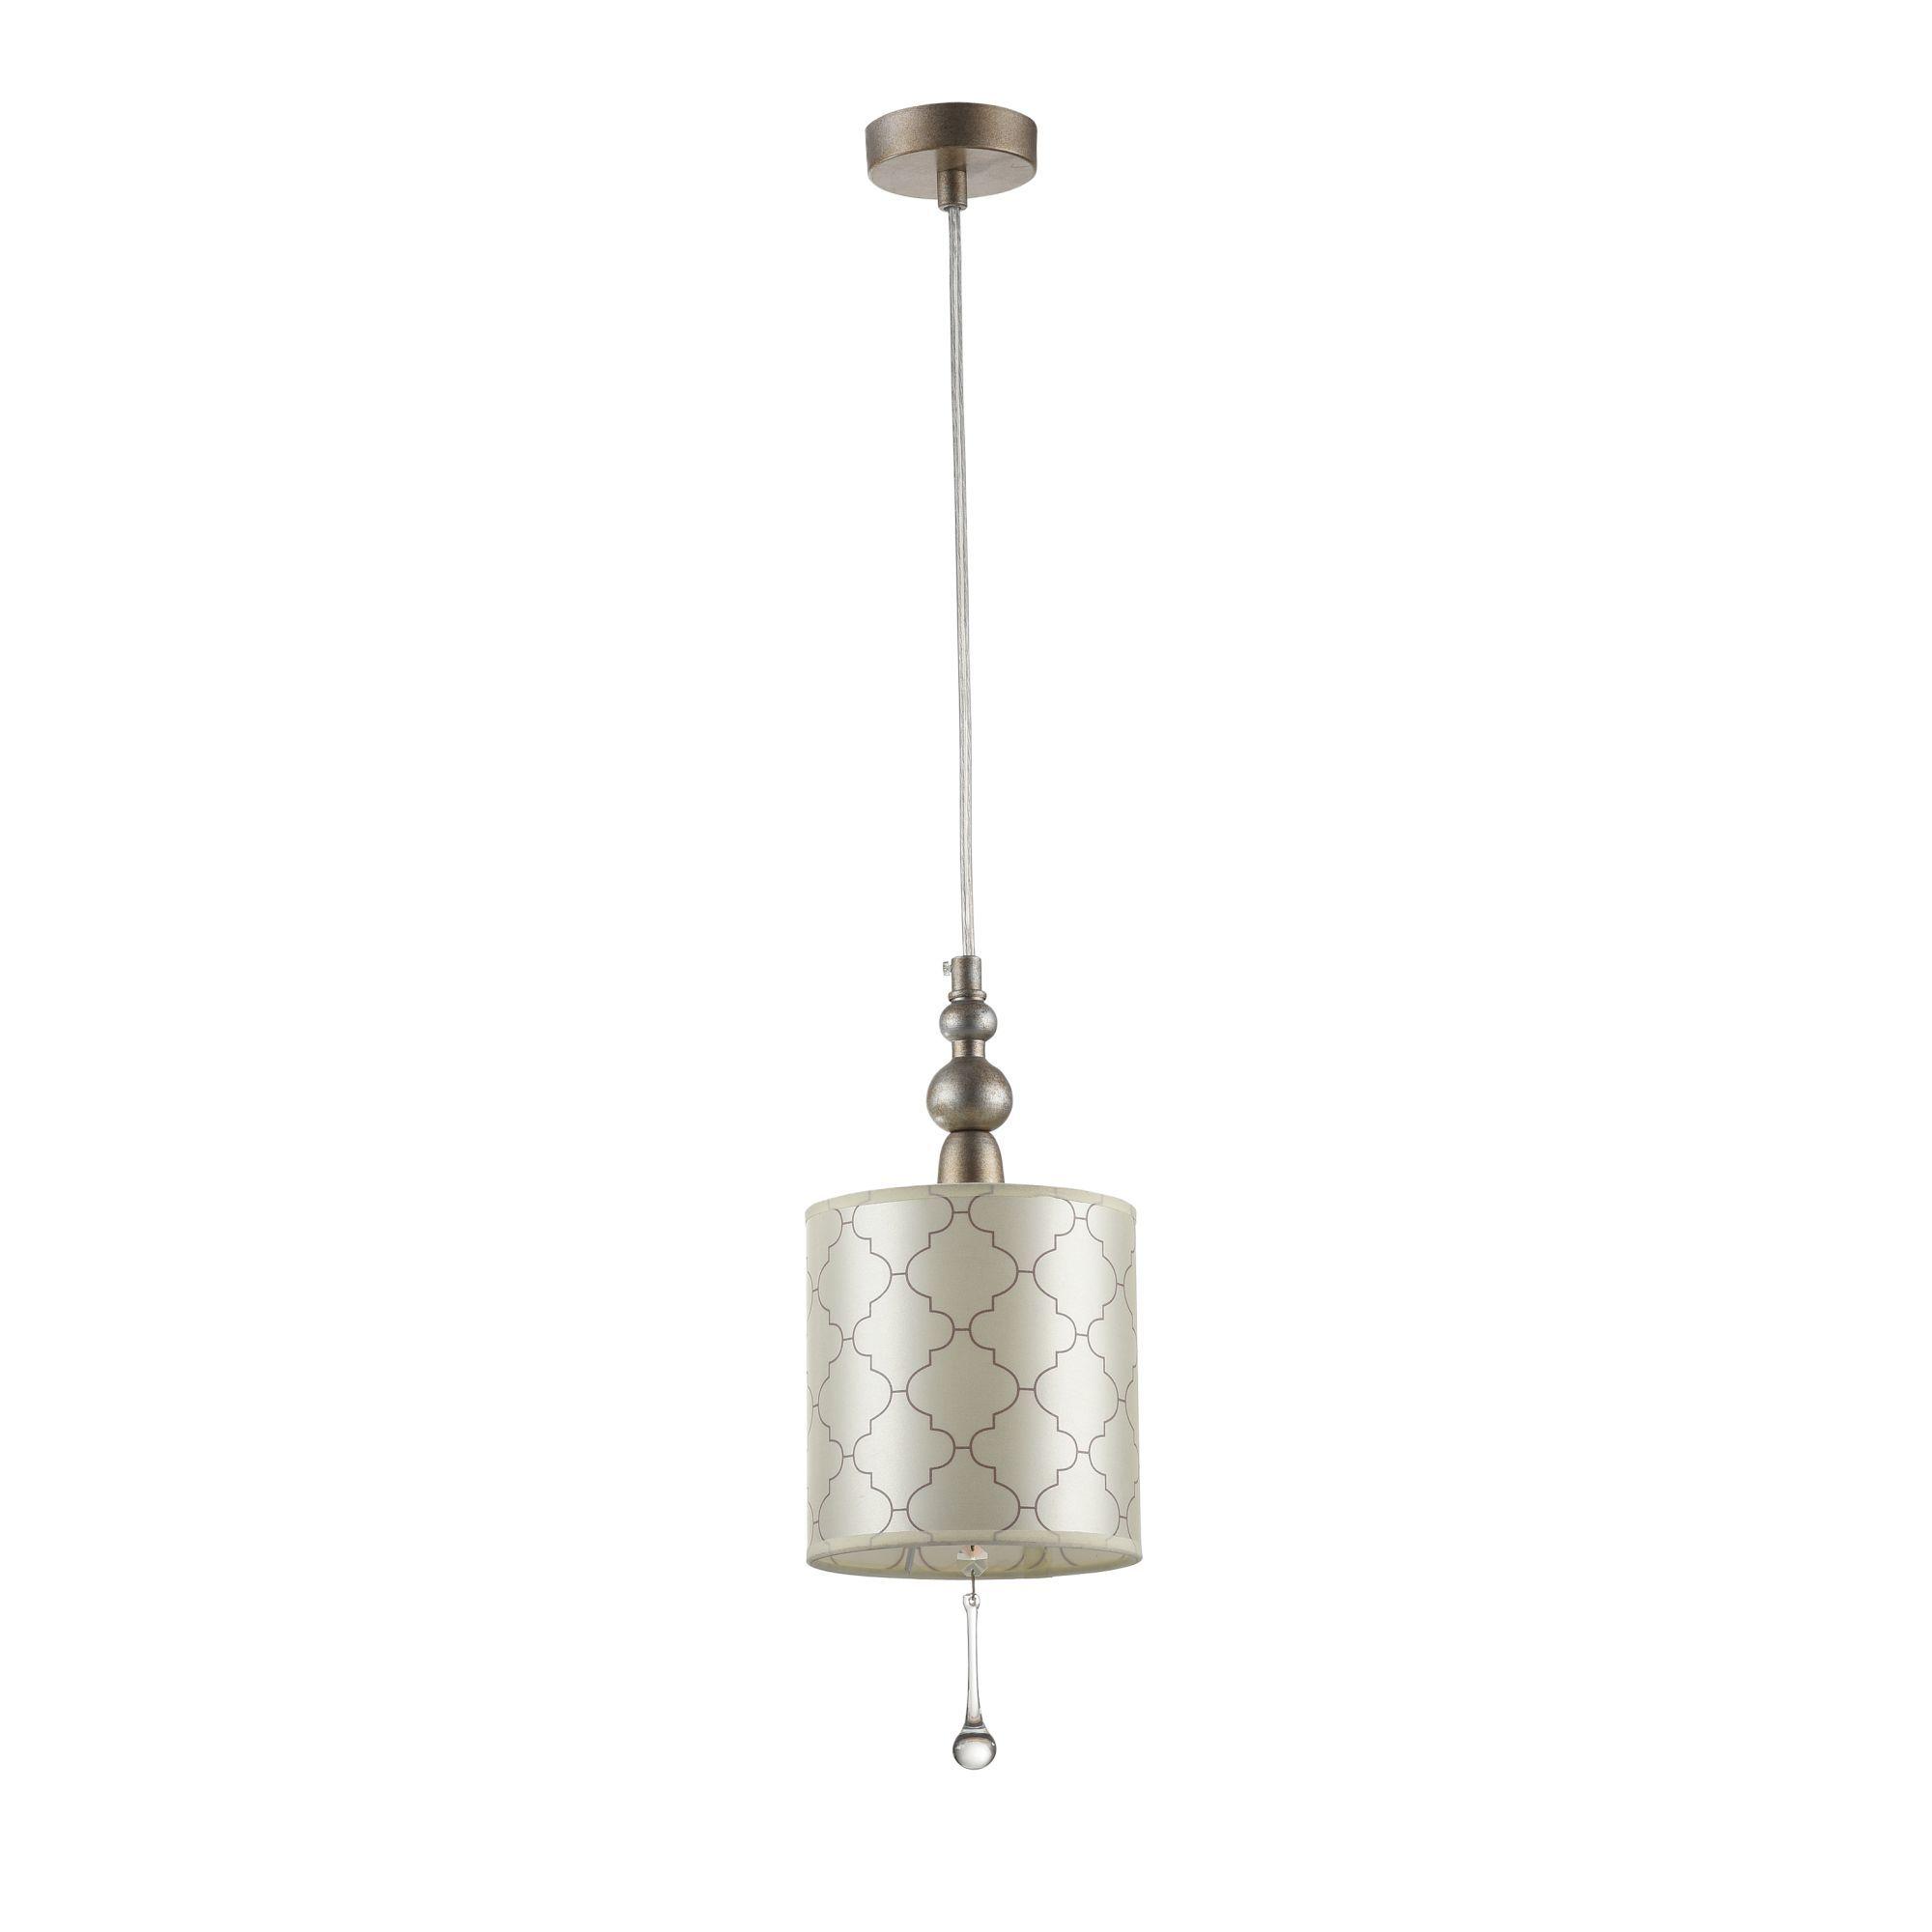 Подвесной светильник Maytoni Bience H018-PL-01-NG (dia018-22-ng), 1xE14x40W, серебро, бежевый, прозрачный, металл, текстиль, хрусталь - фото 3